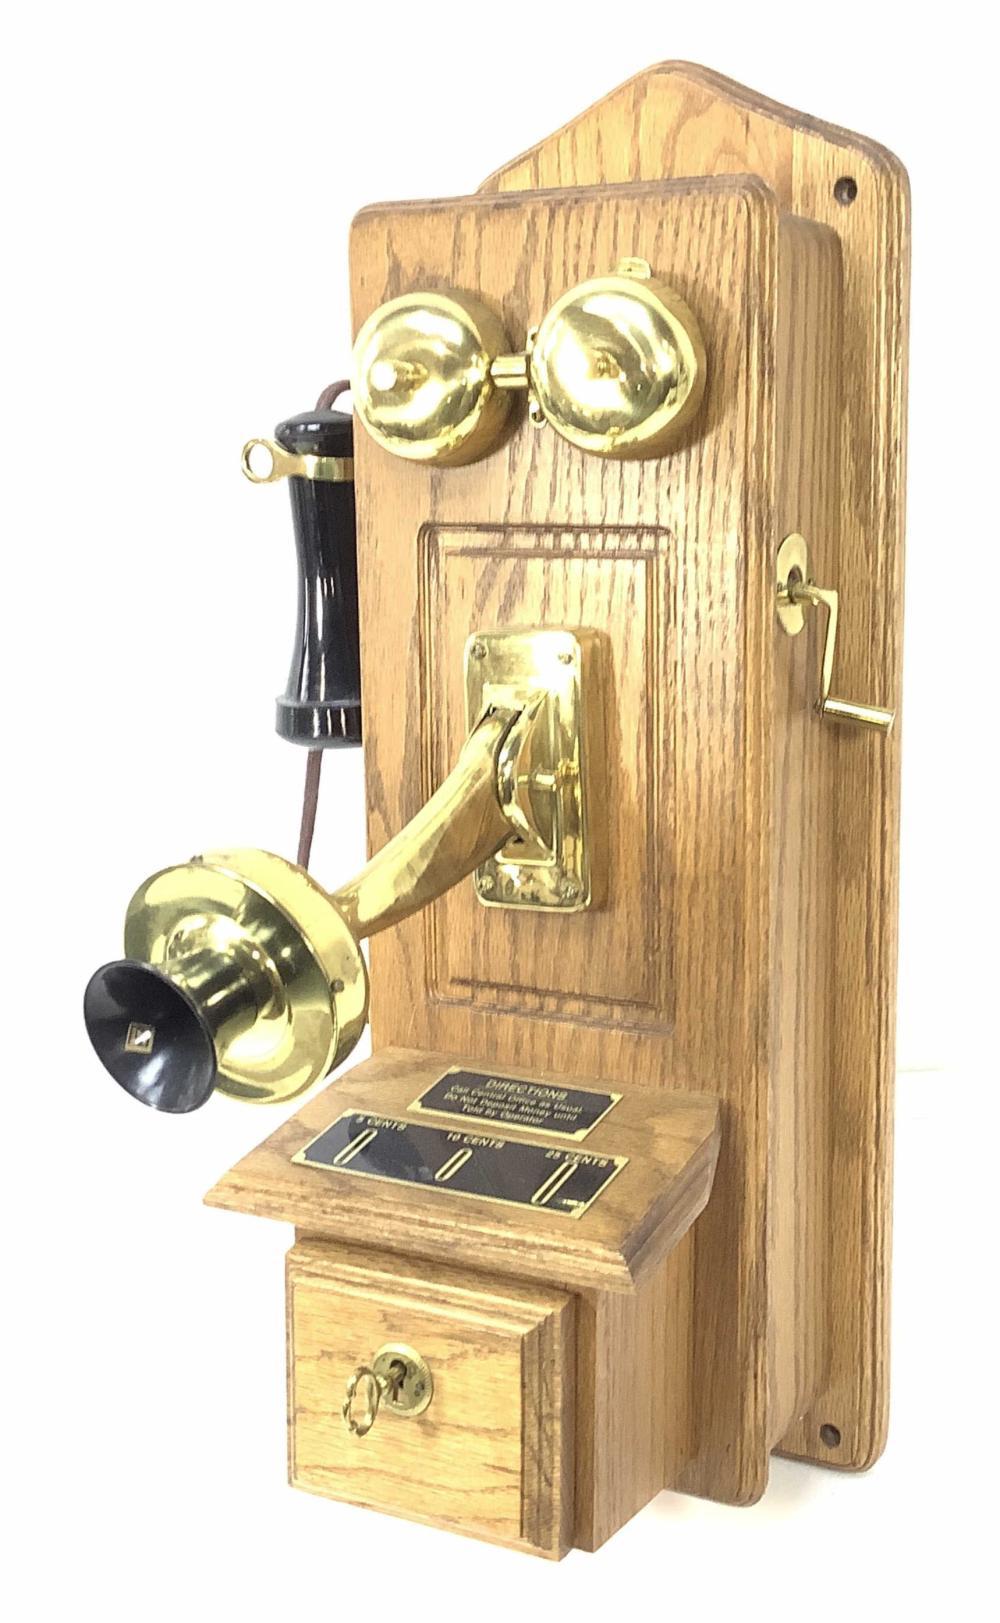 Kellogg Crank Style Oak Case Telephone